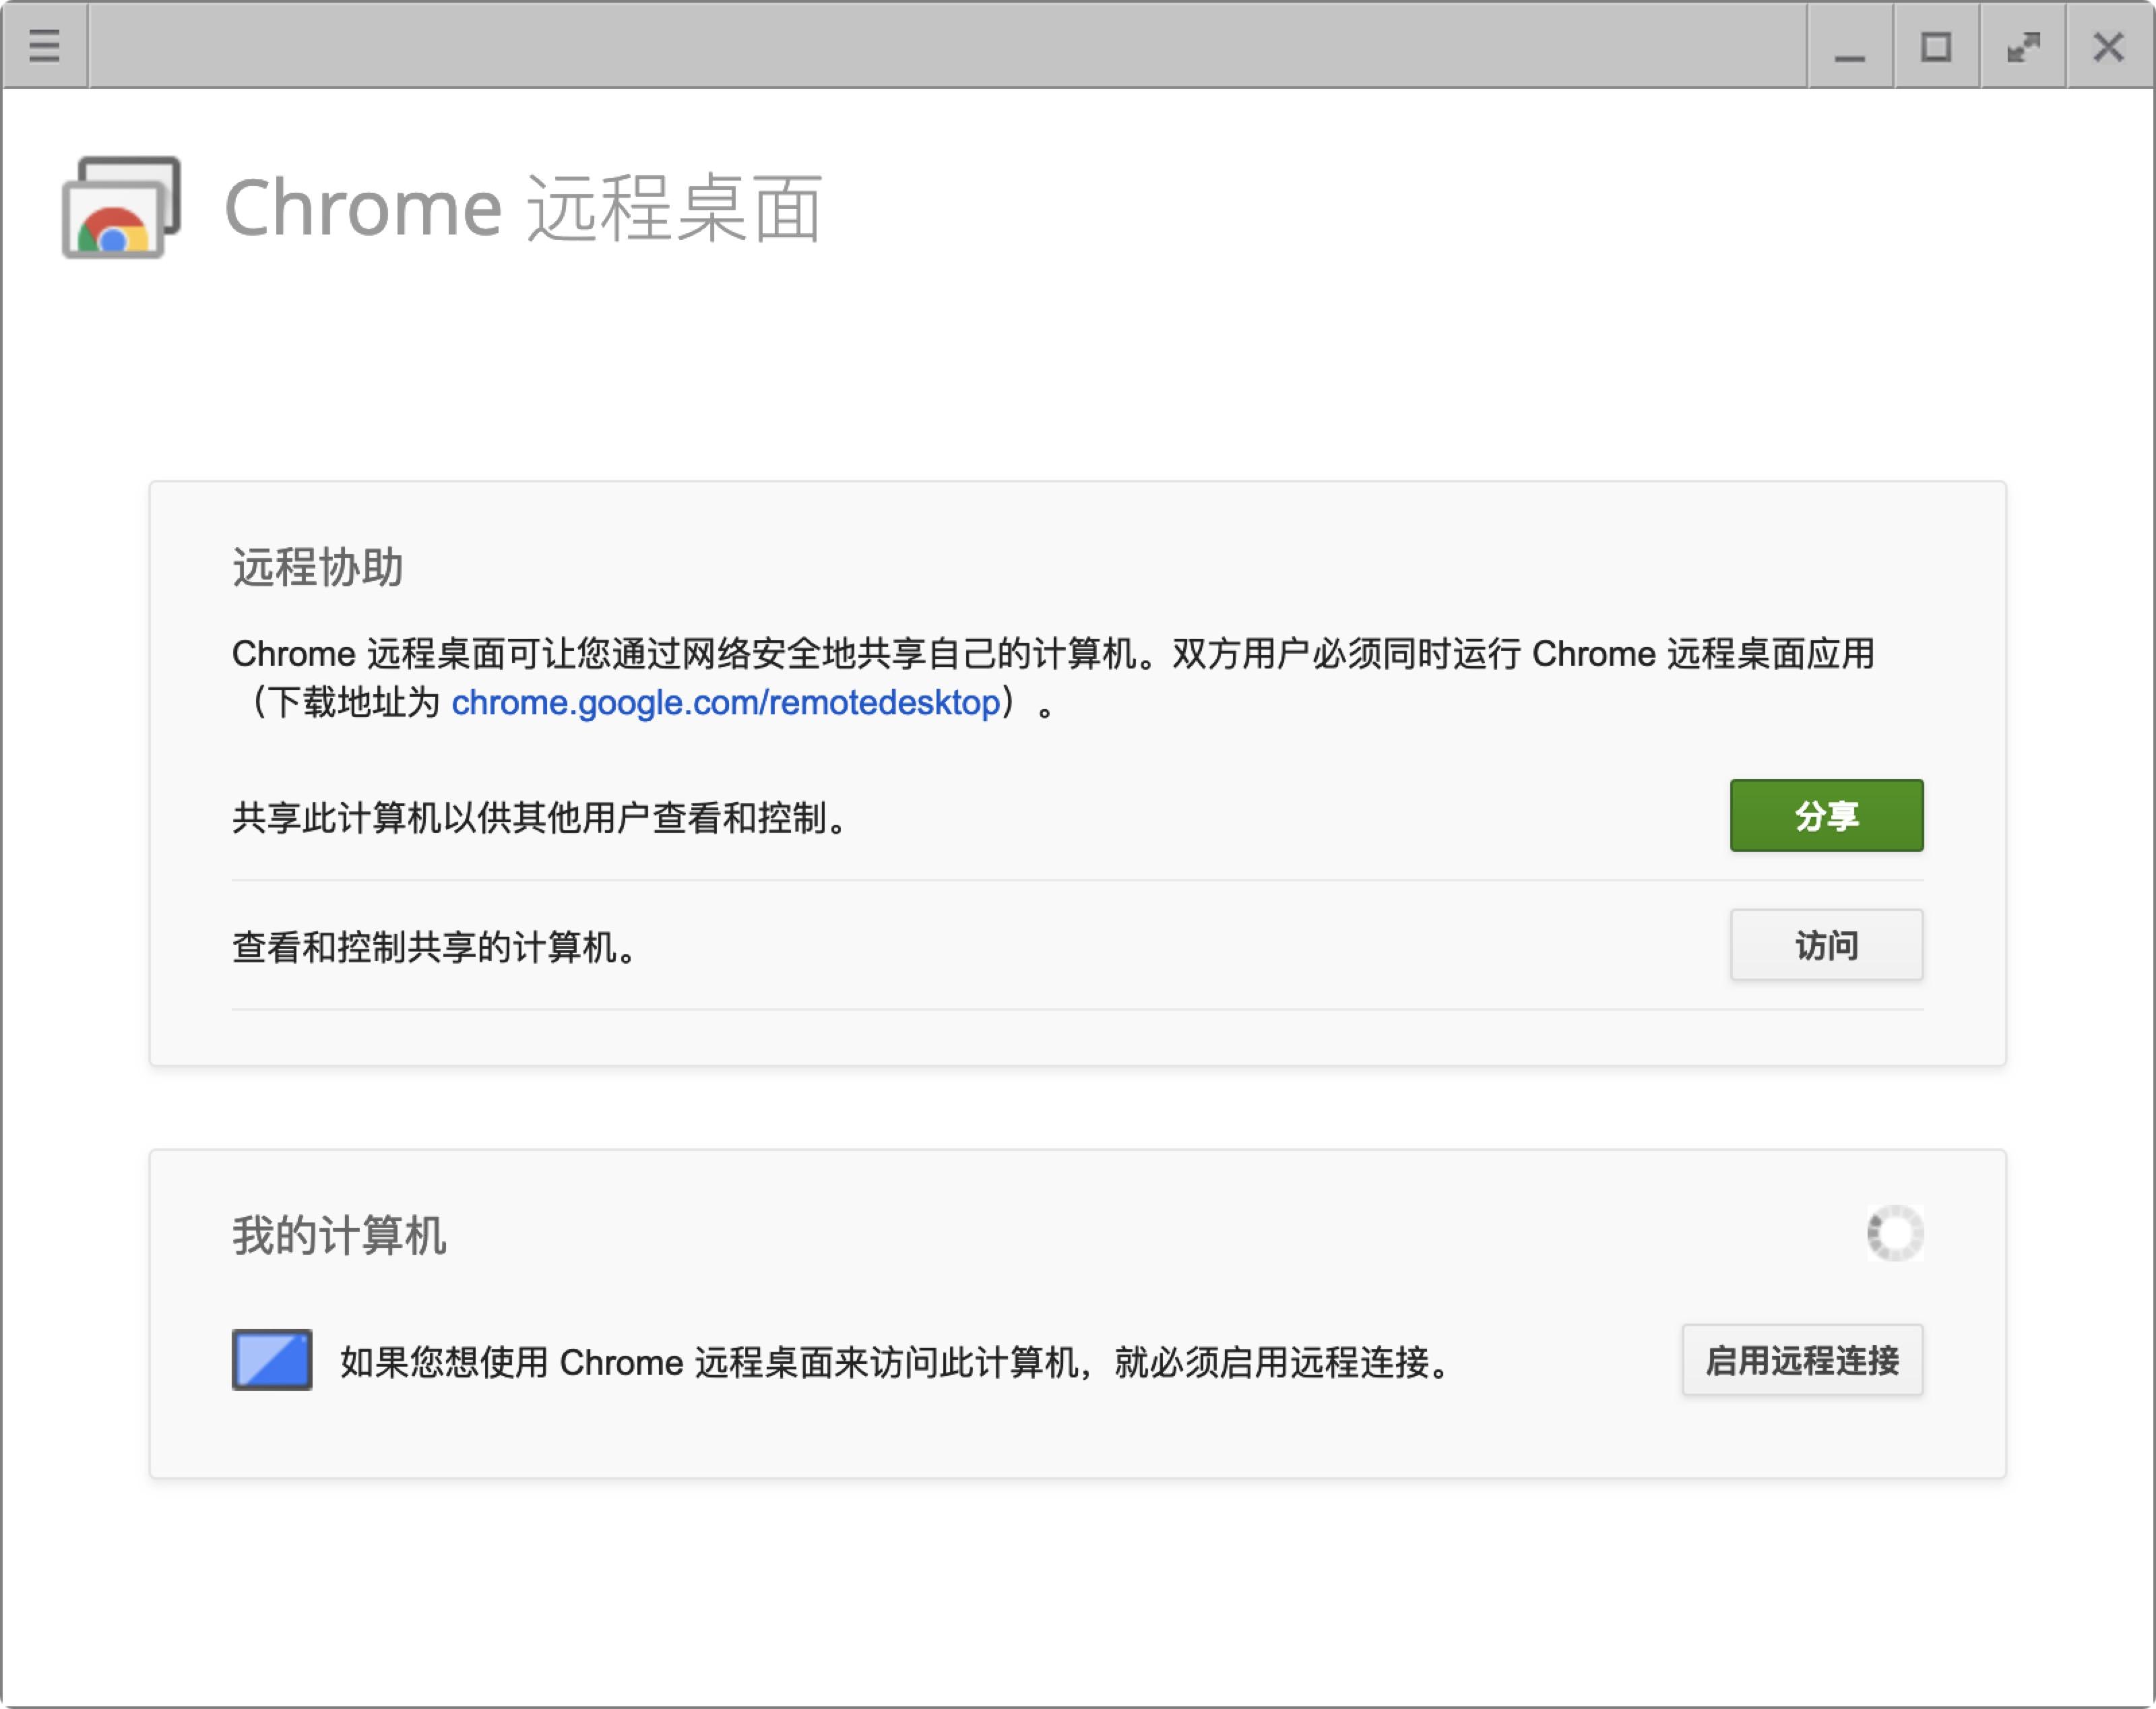 2chrome远程桌面.jpg